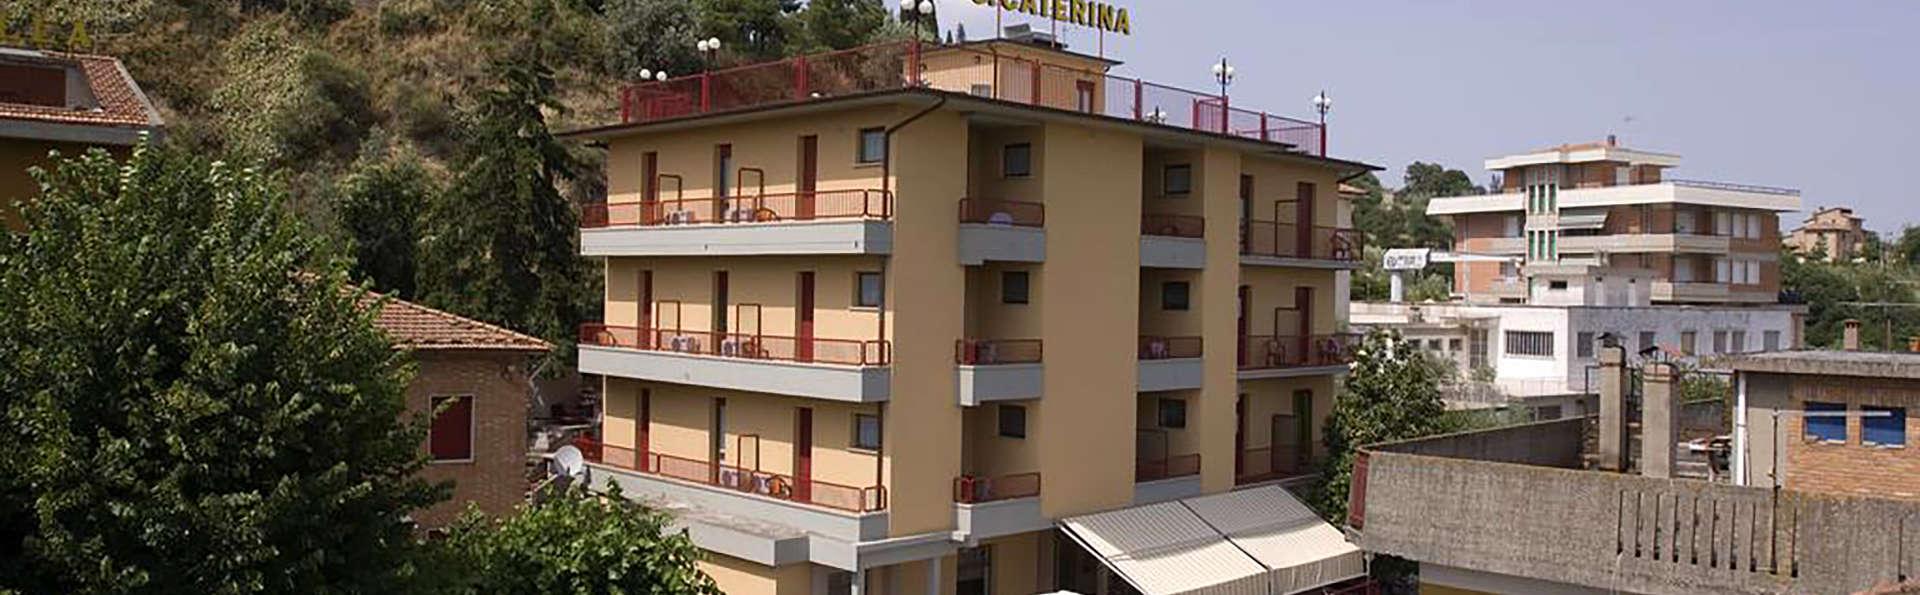 Hotel Santa Caterina - Edit_Front.jpg